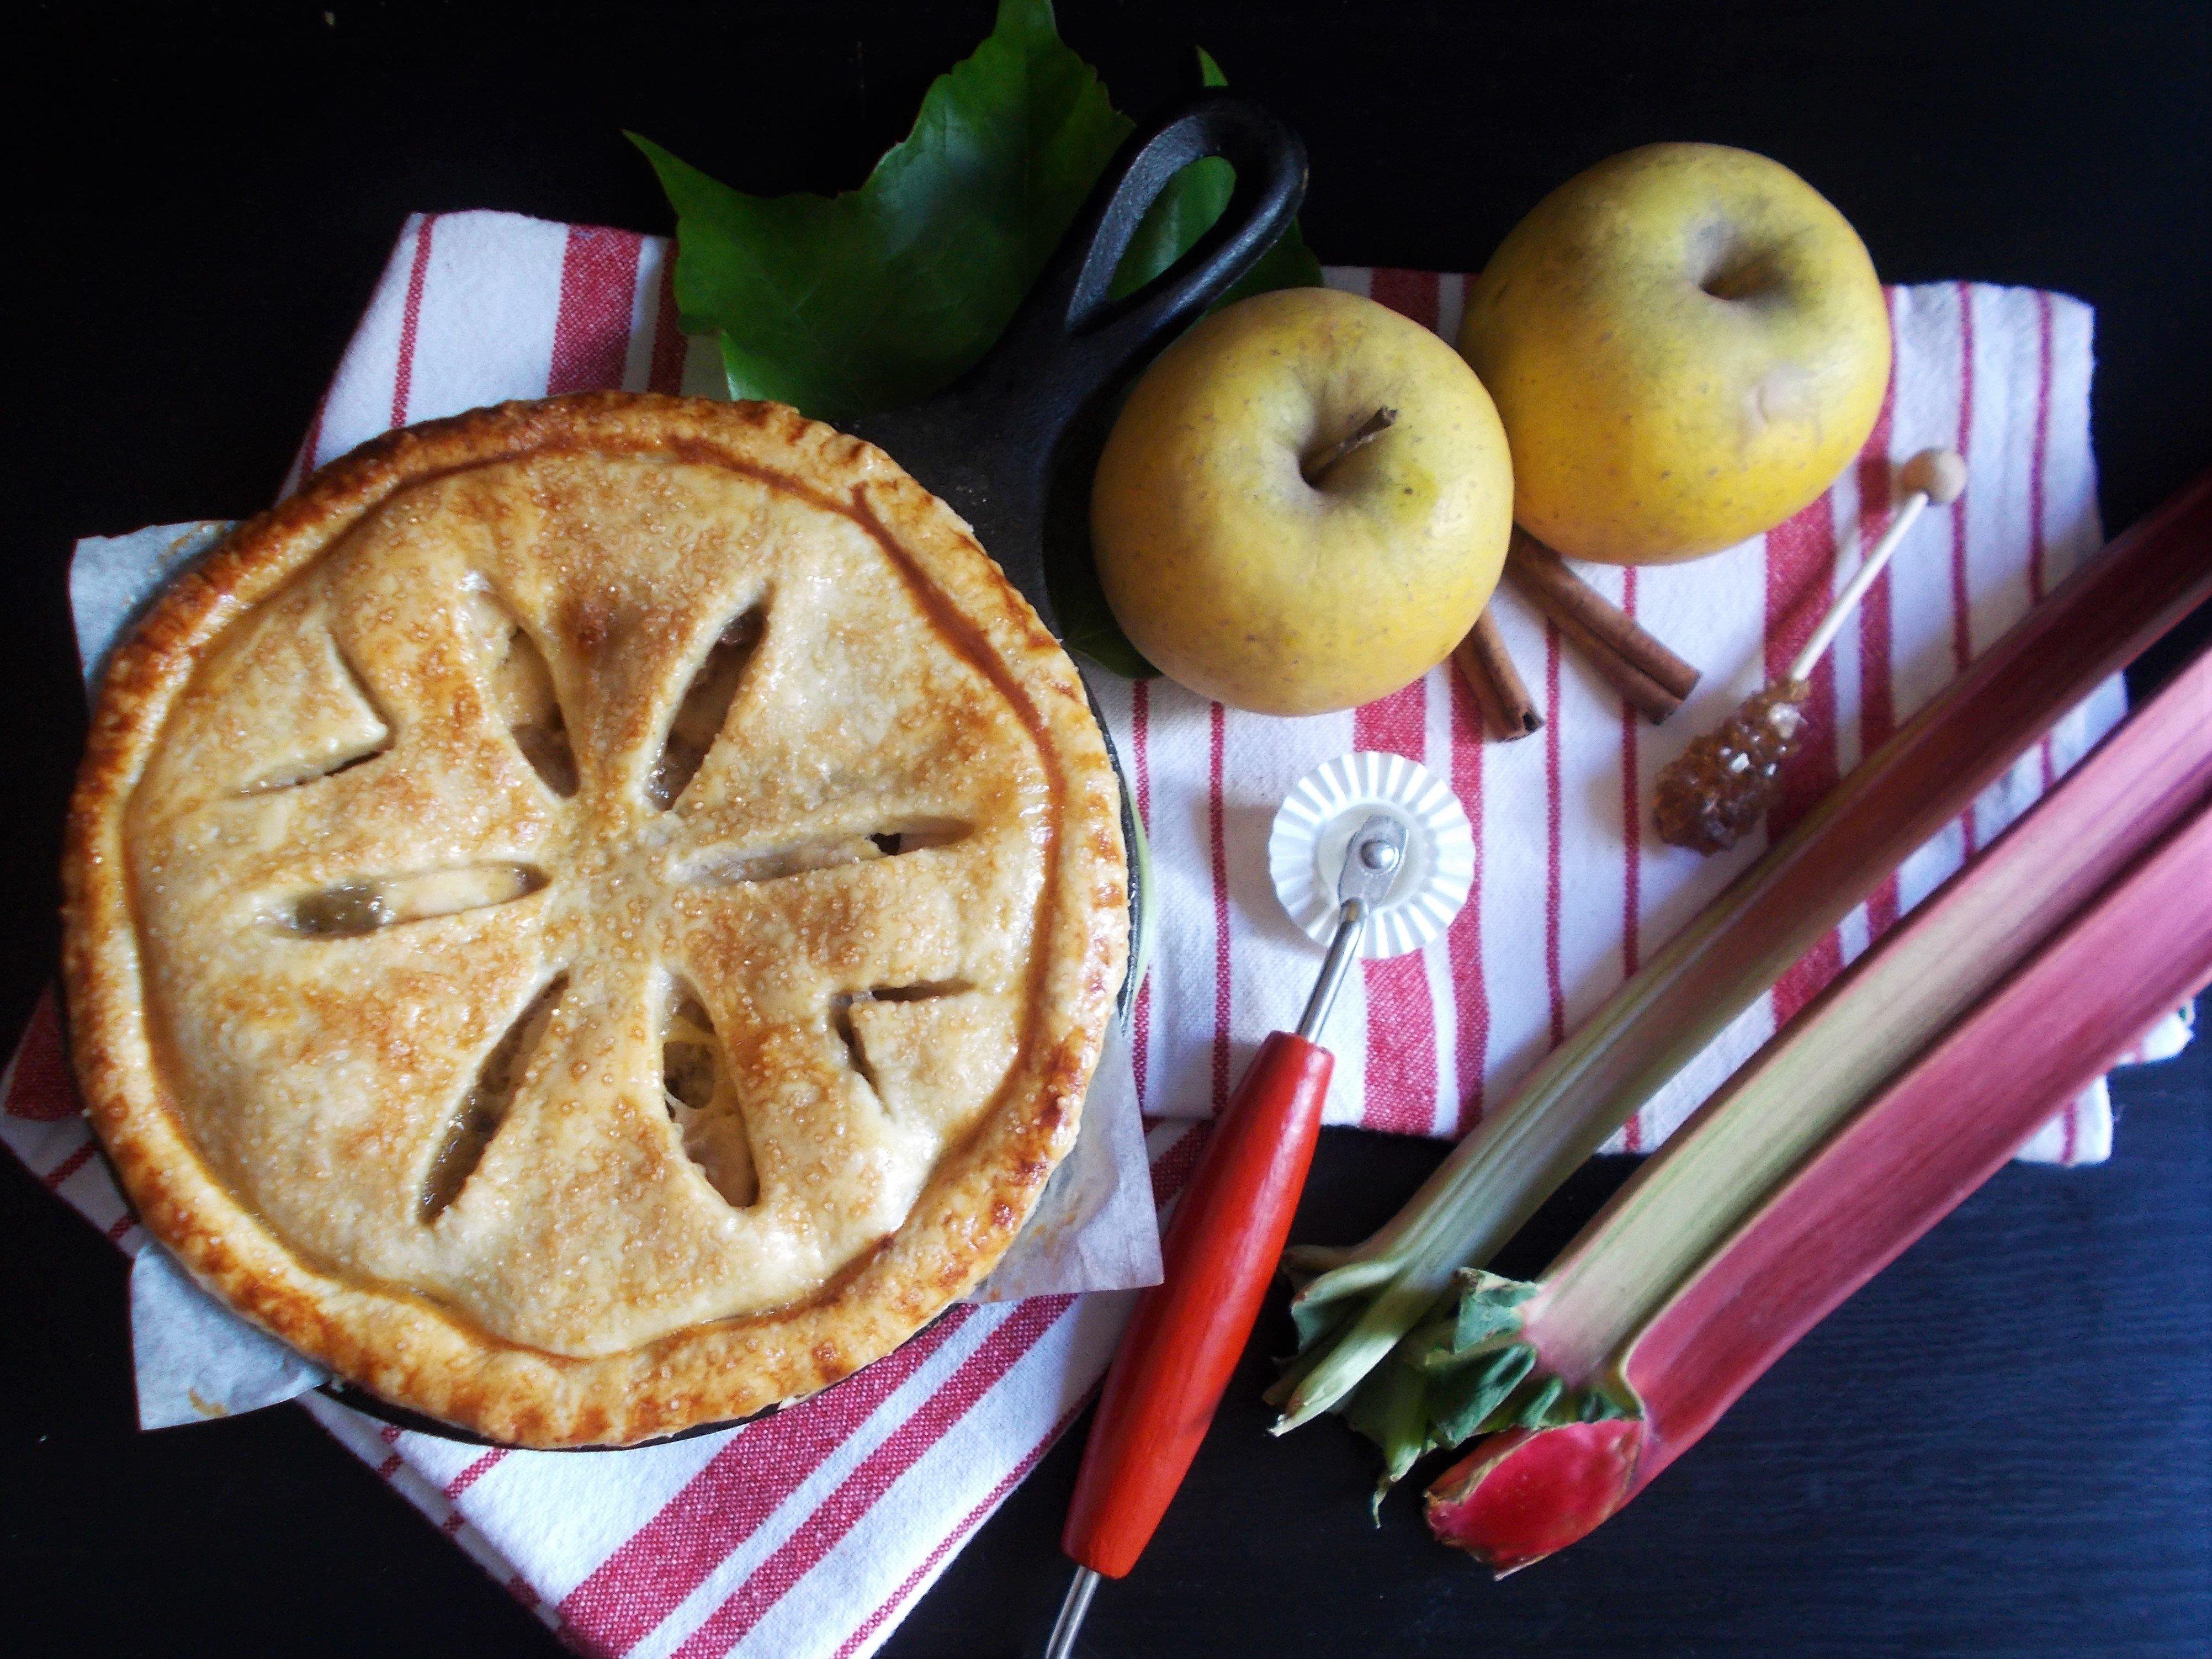 Apple Pie rhubarbe et raisins secs